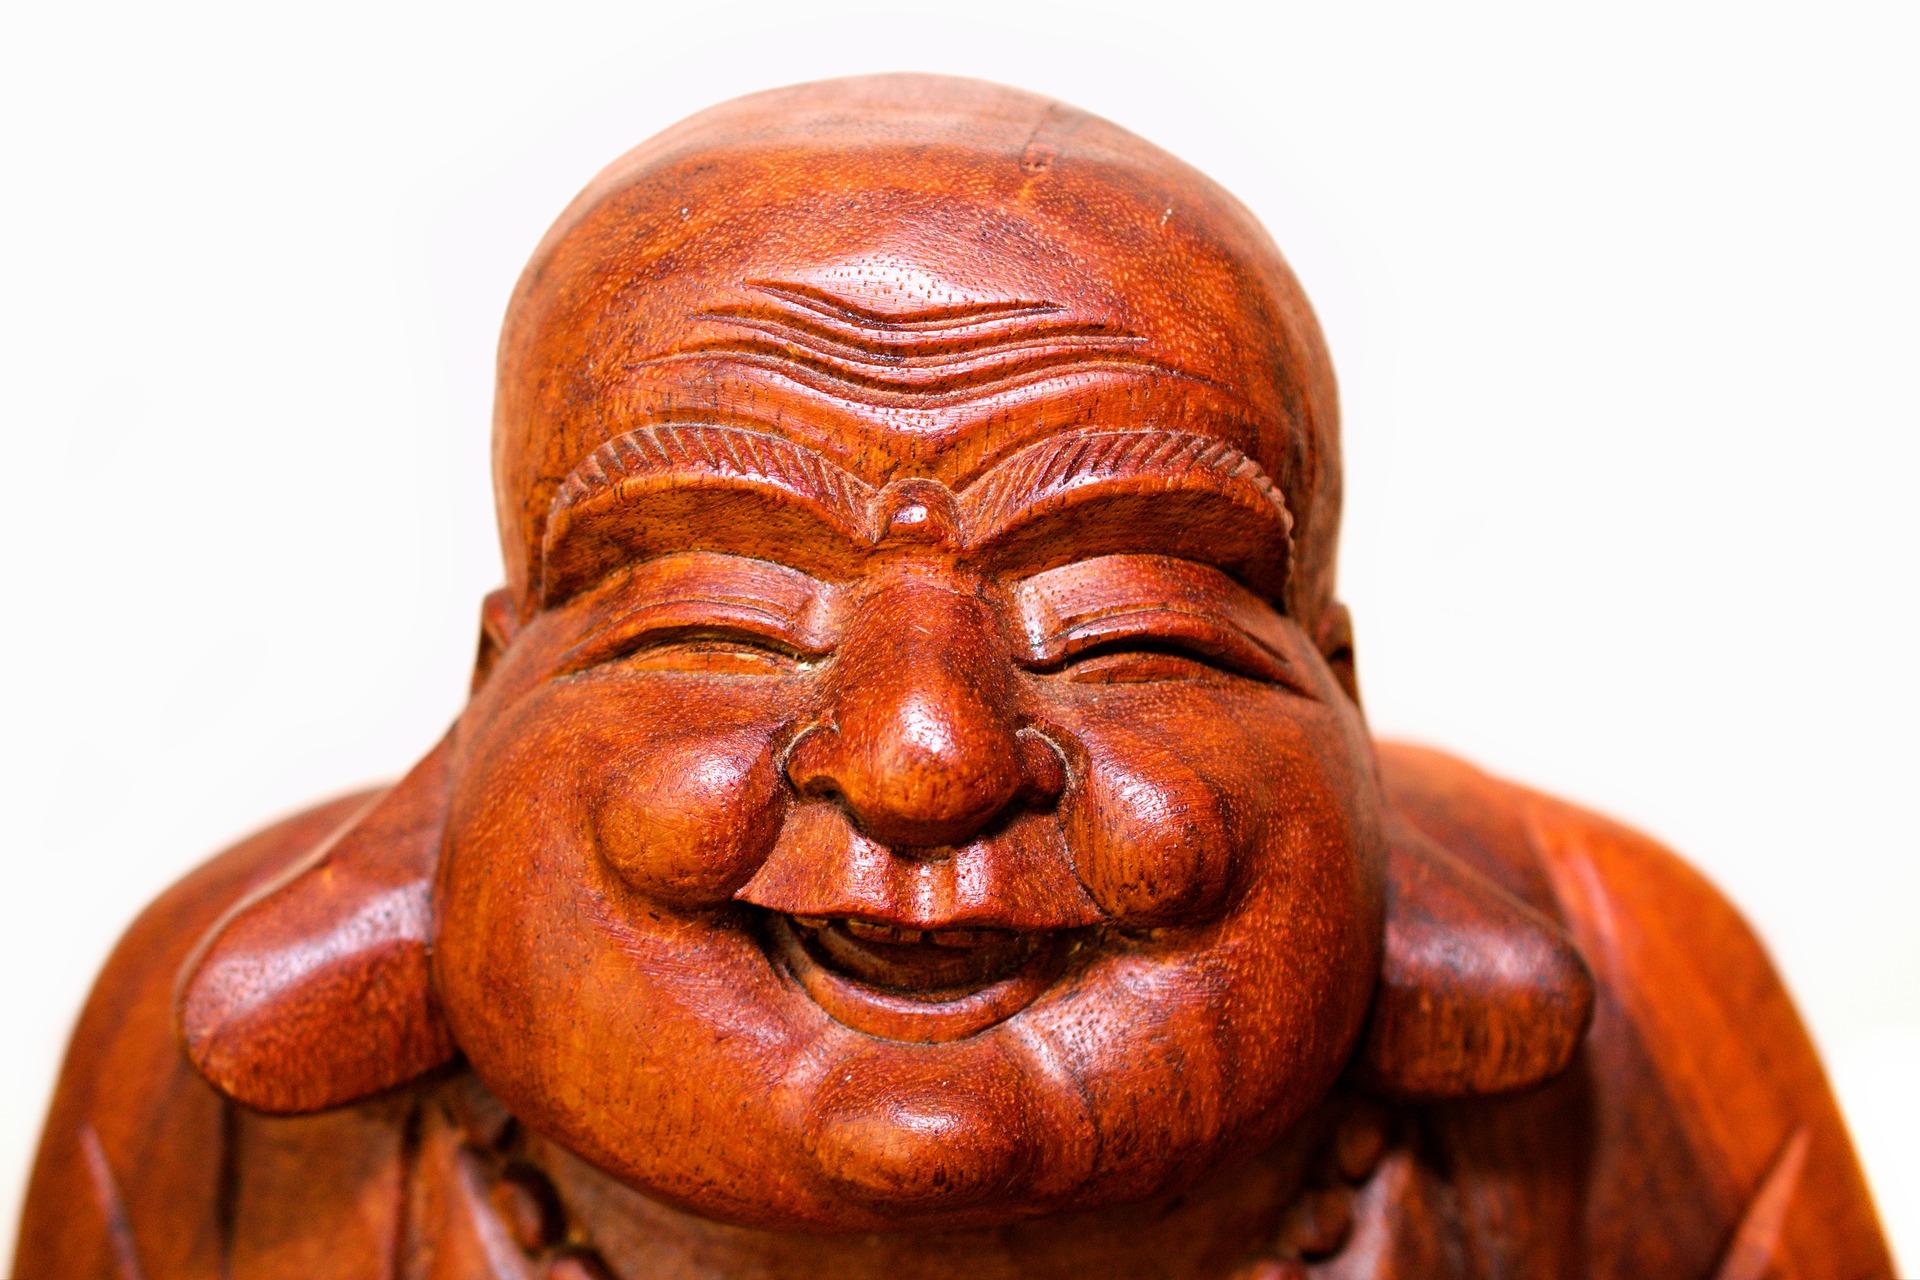 laughing-buddha-head-4191700_1920.jpg